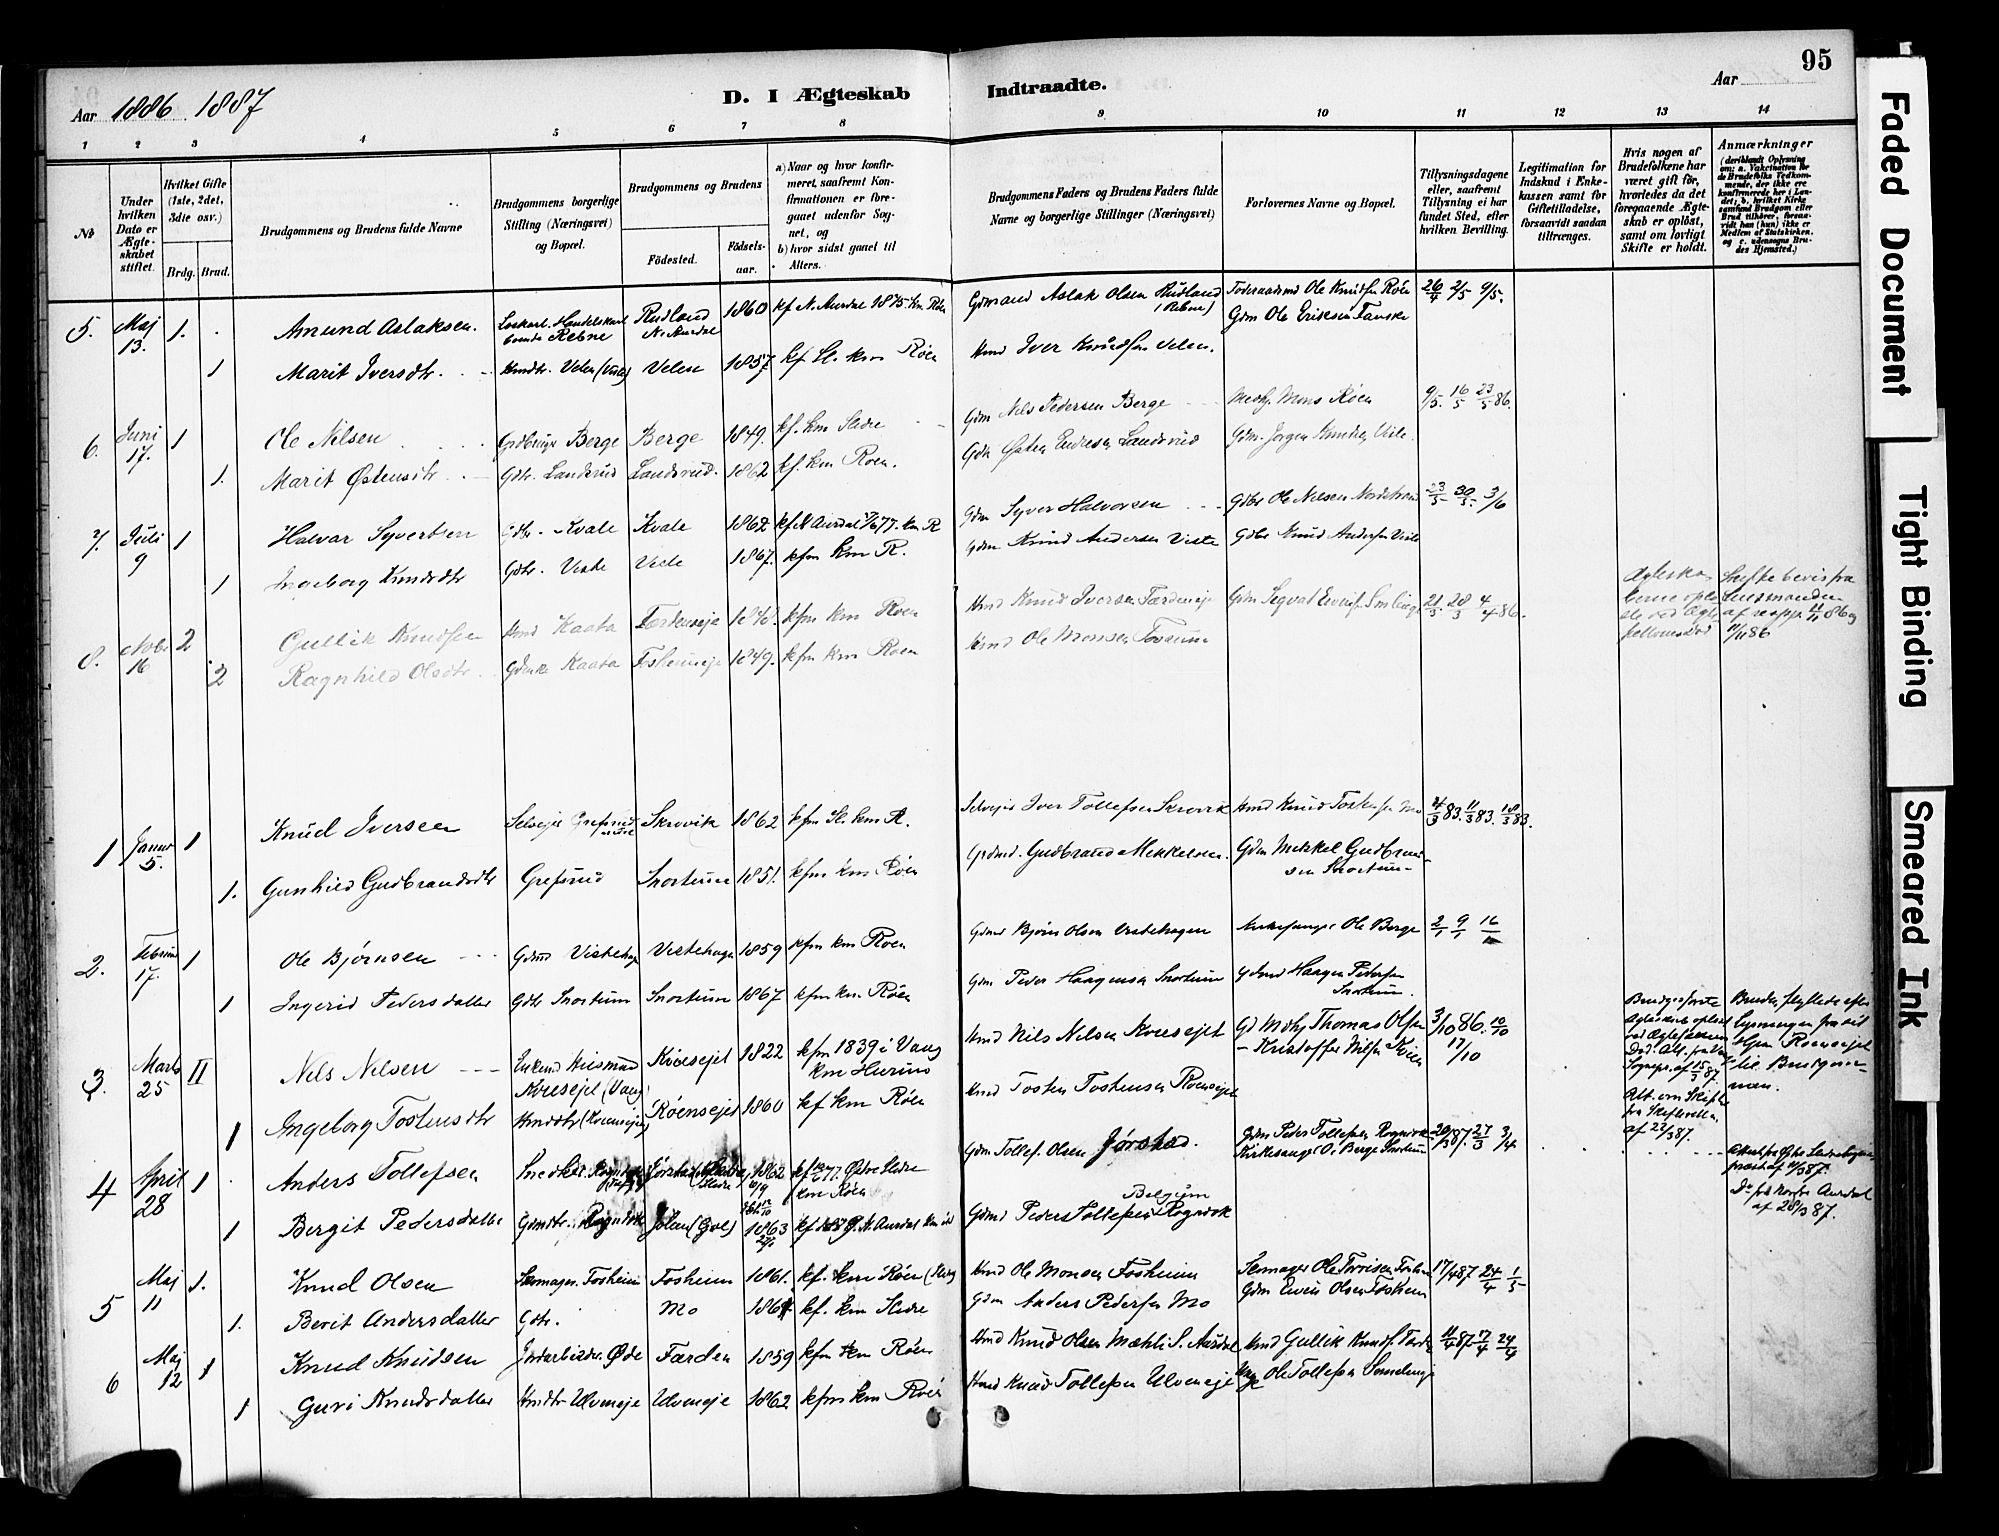 SAH, Vestre Slidre prestekontor, Ministerialbok nr. 6, 1881-1912, s. 95